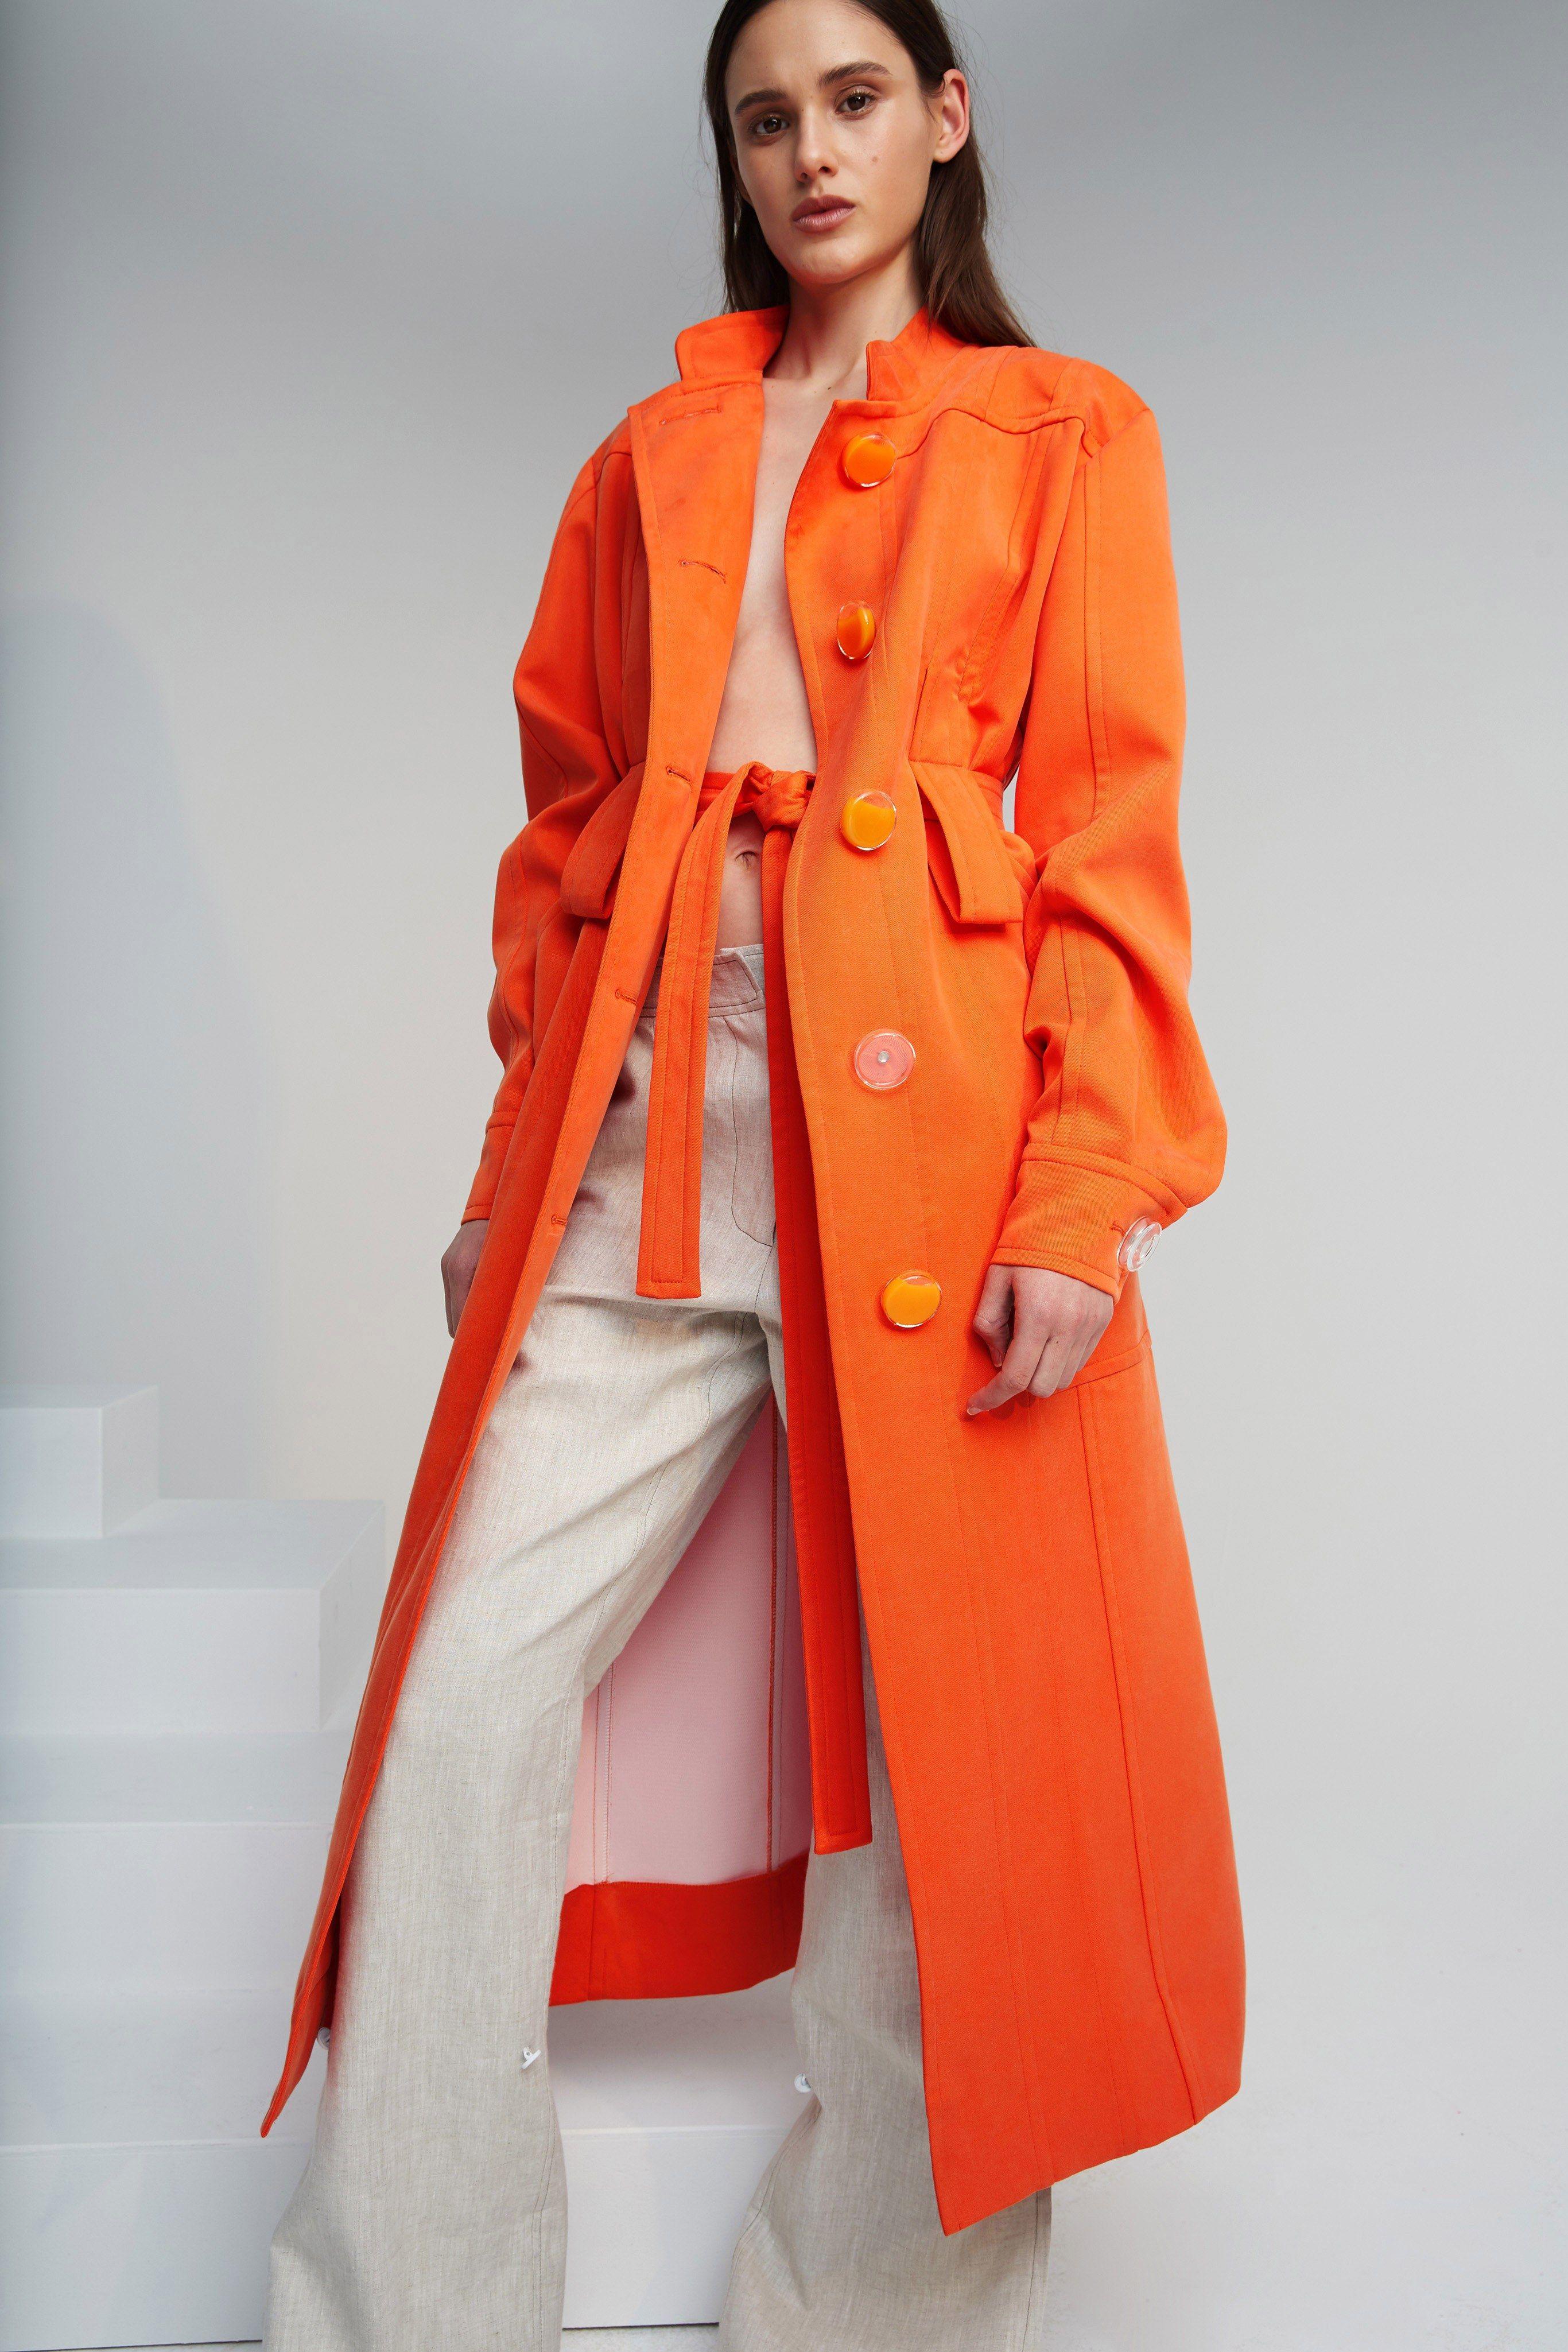 153b69ac06c Christopher Esber Spring 2019 Ready-to-Wear Fashion Show in 2019 ...